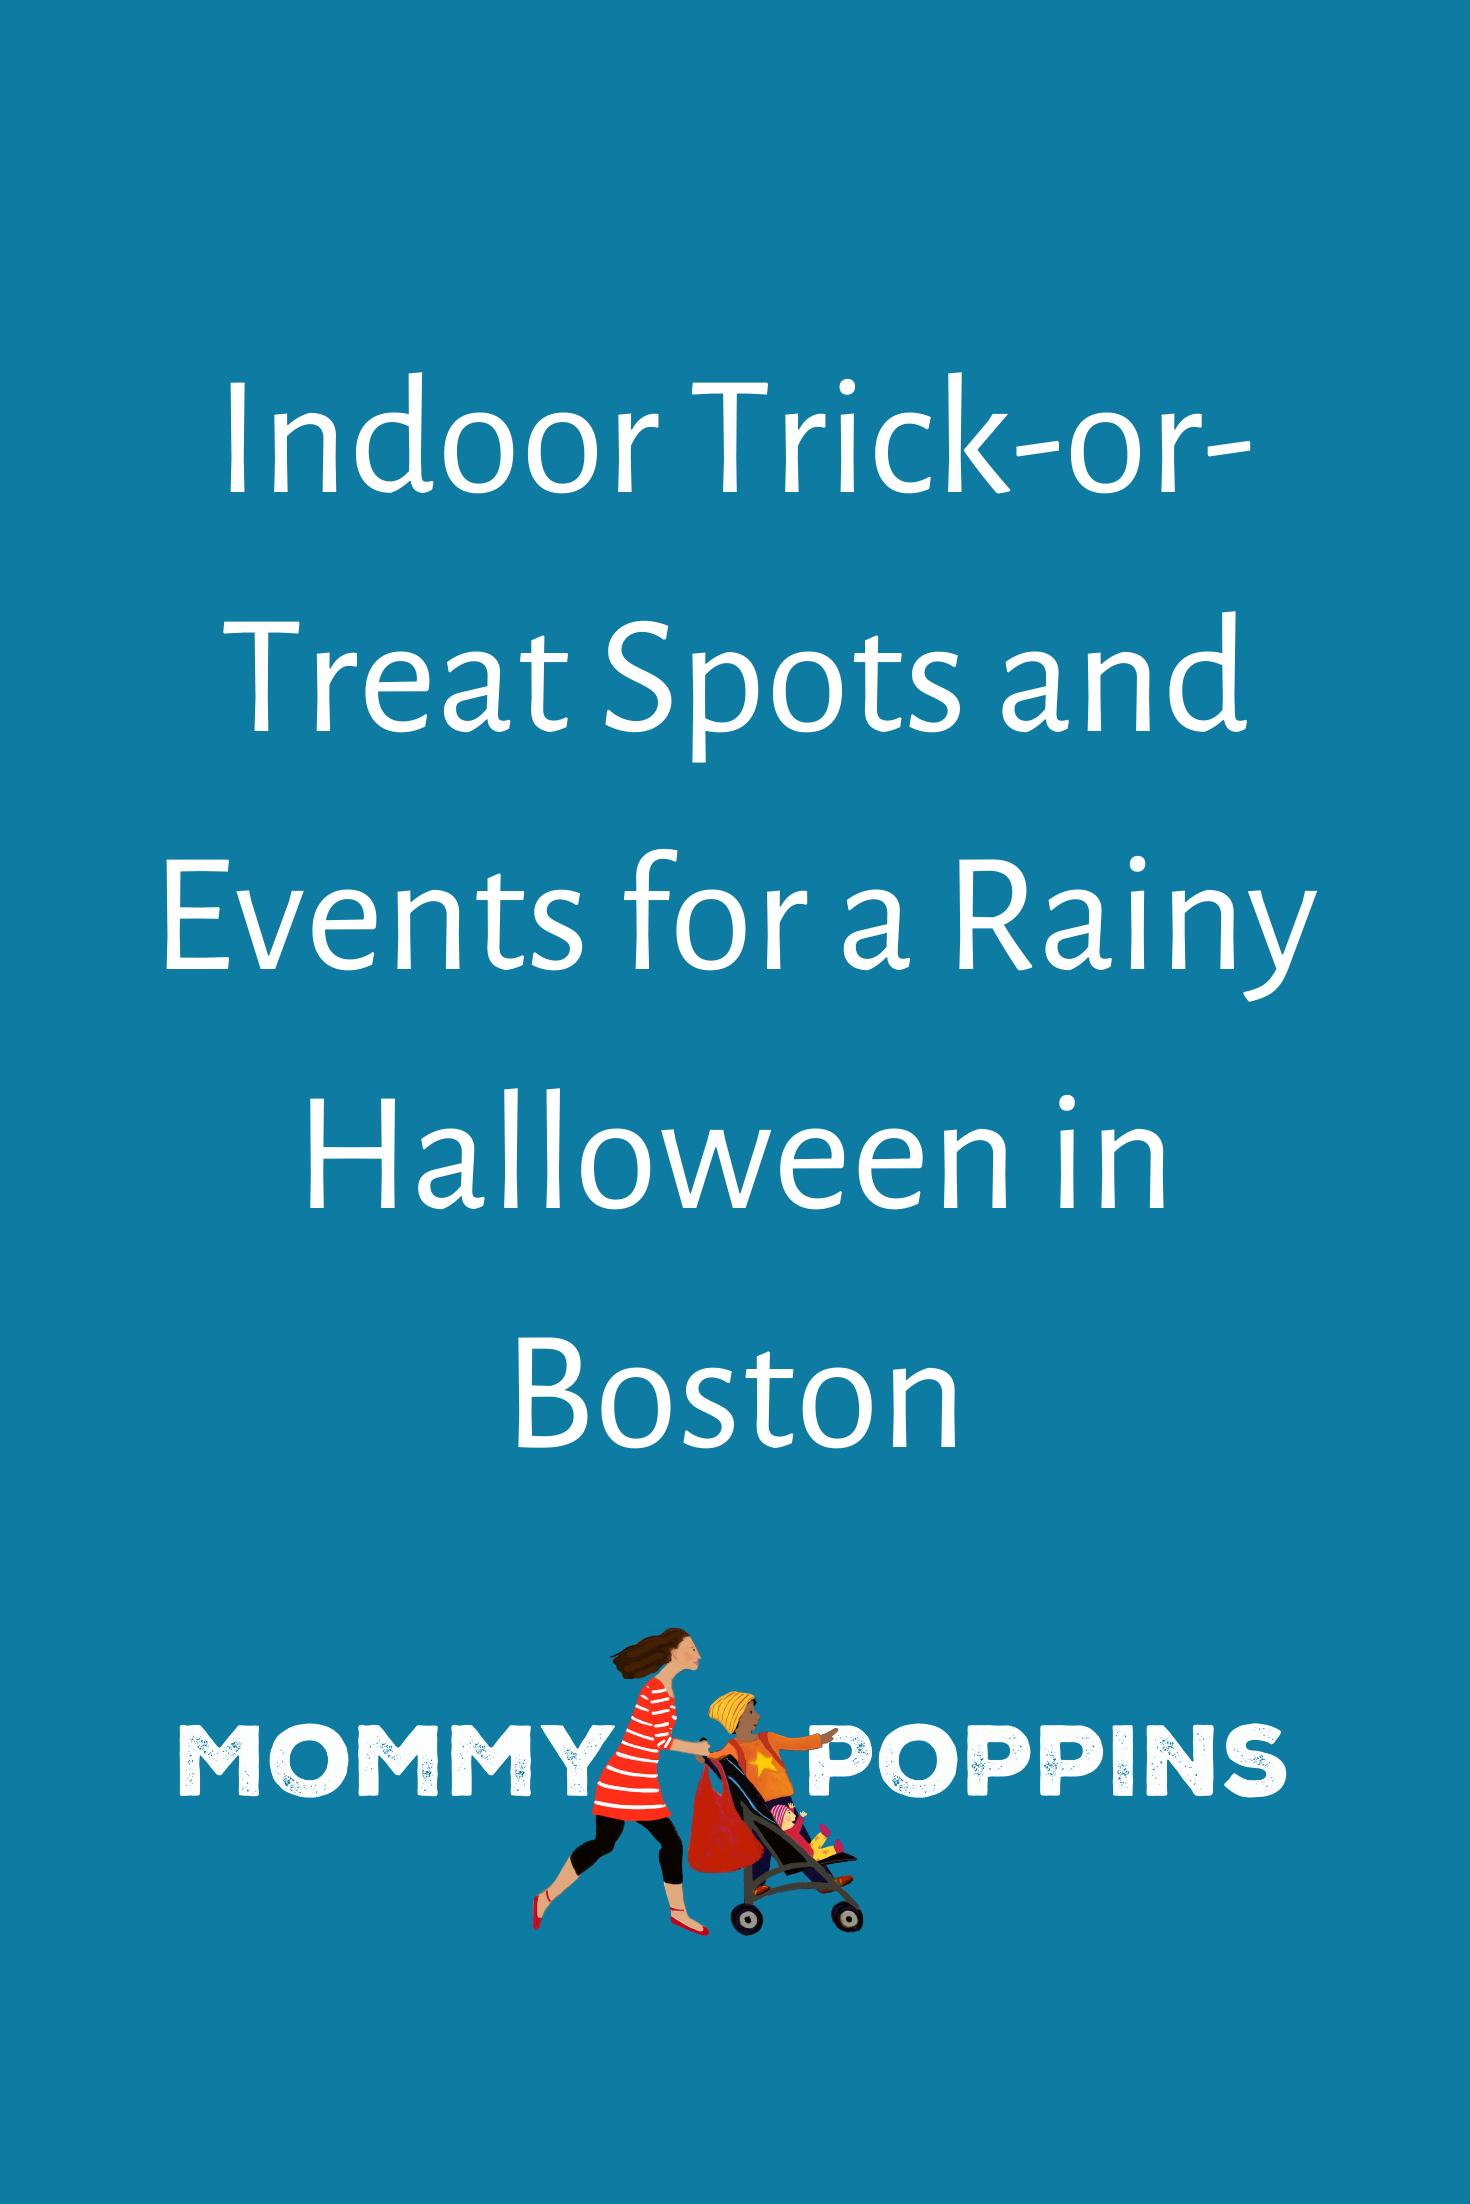 Indoor TrickofTreating Spots for BostonArea Kids on